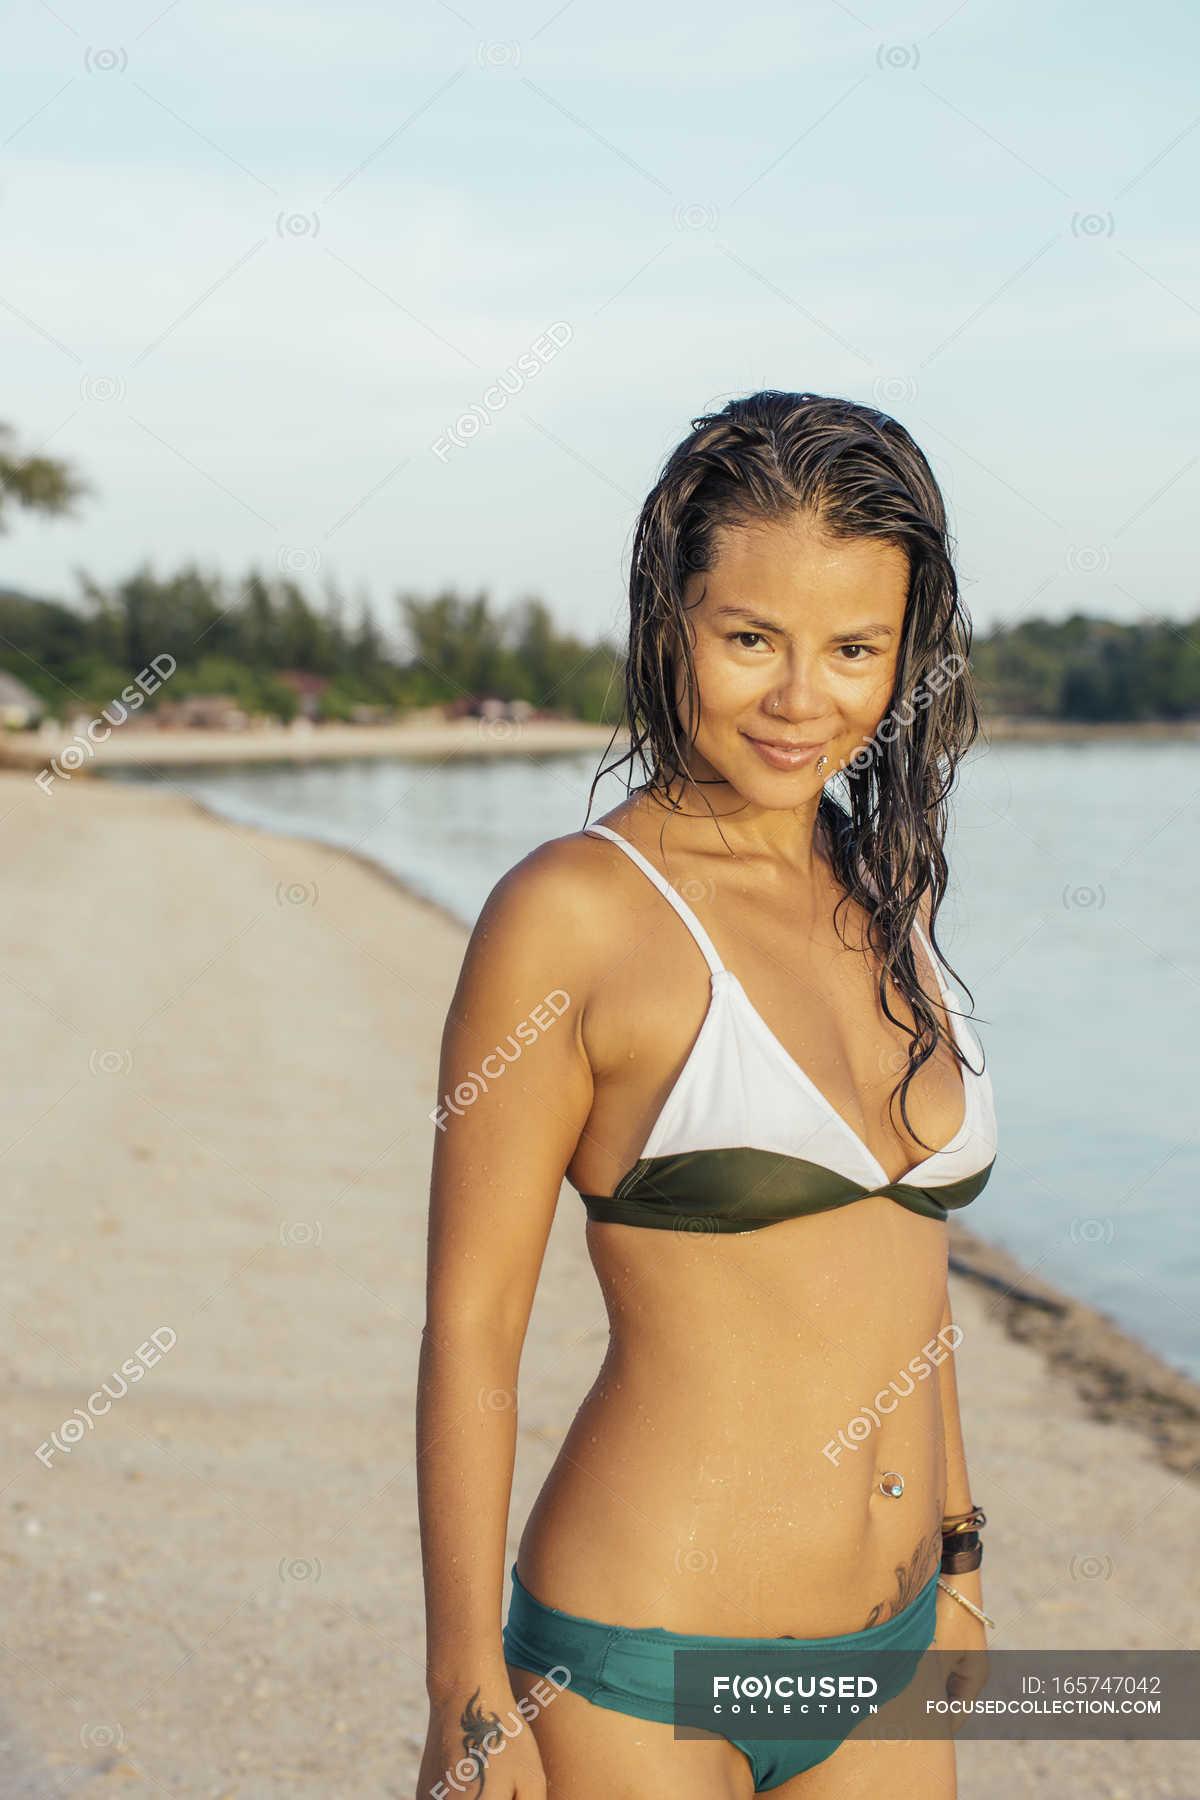 intimschmuck am strand